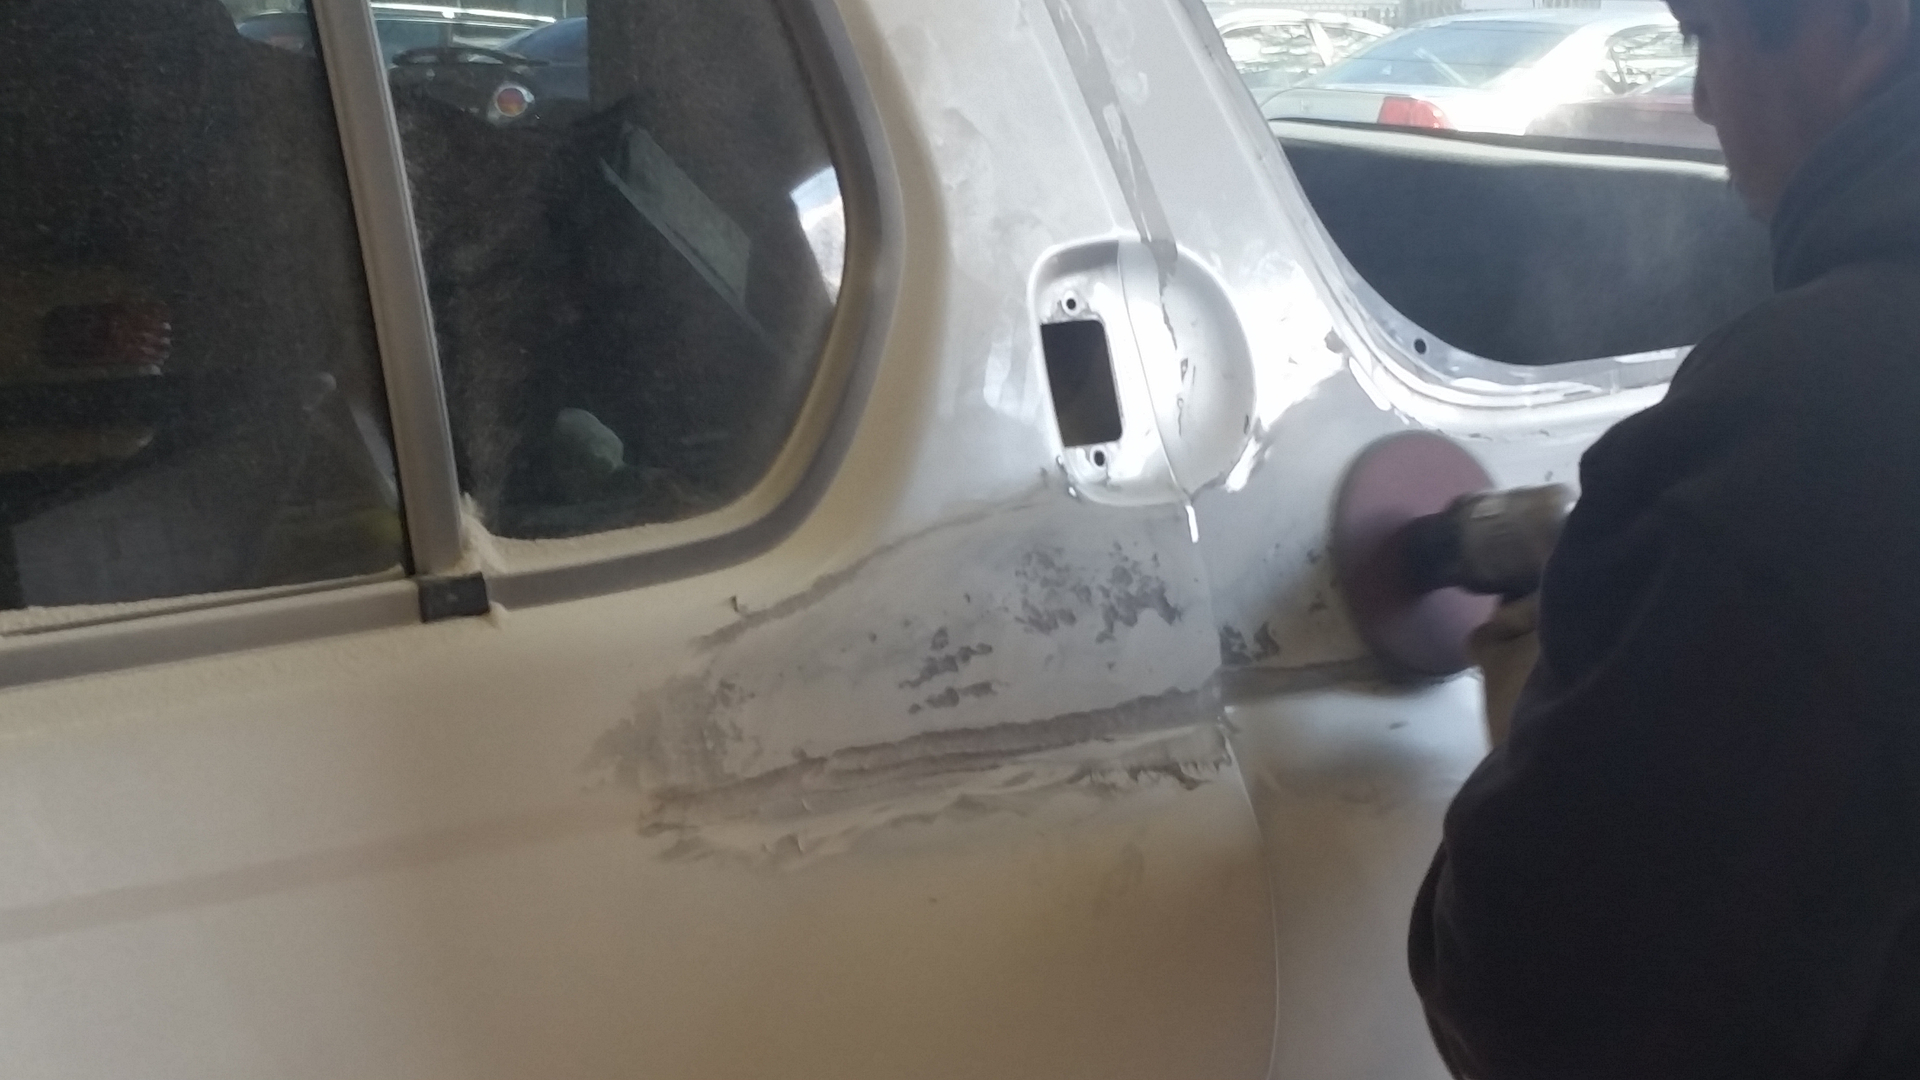 up jeep black chrysler com touch best honda amazon otoriyoce paint dodge